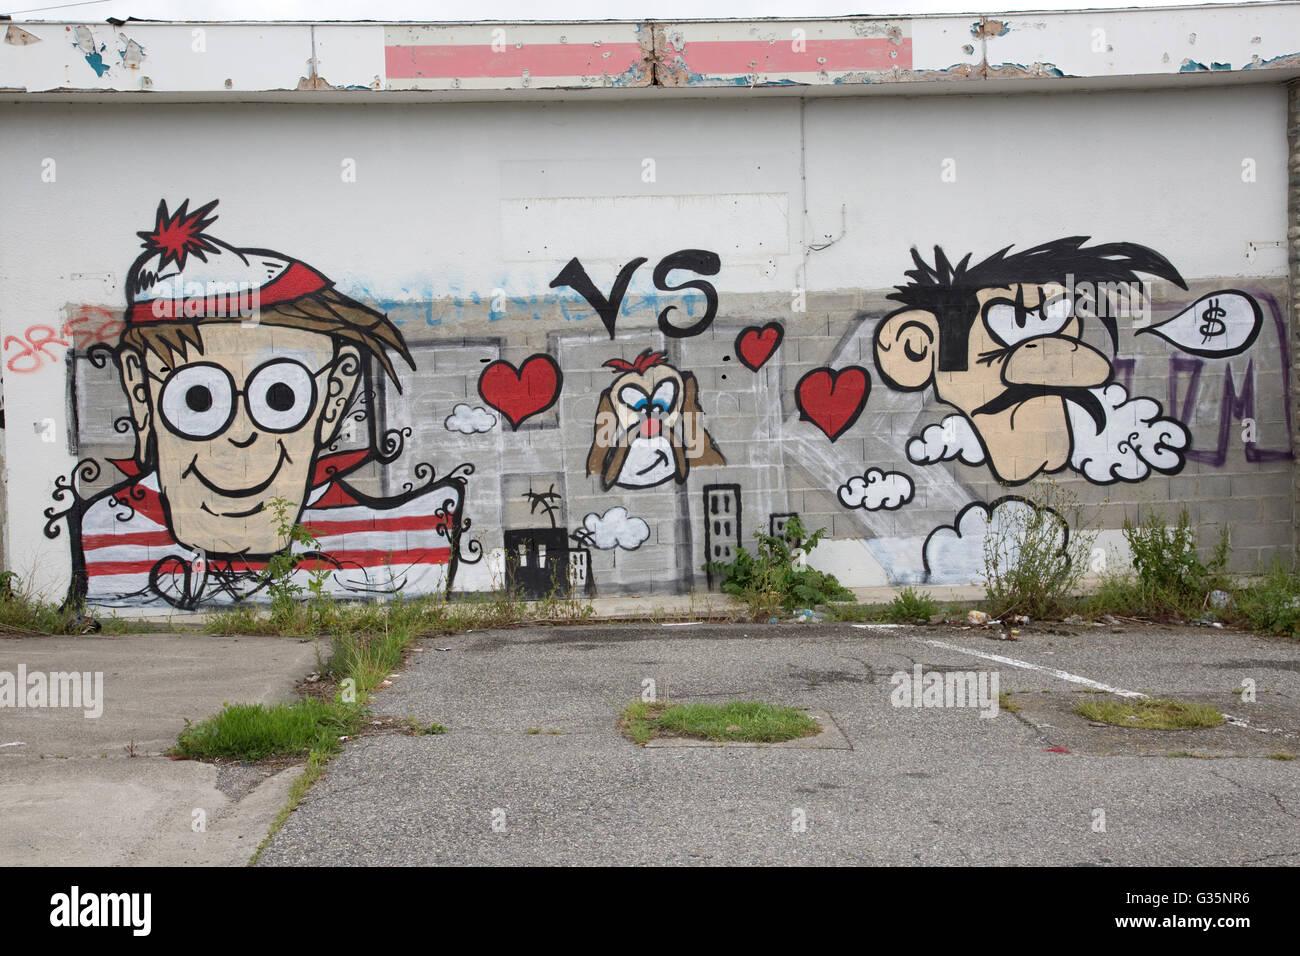 graffiti art crime wall garage building france stock photo graffiti art crime wall garage building france